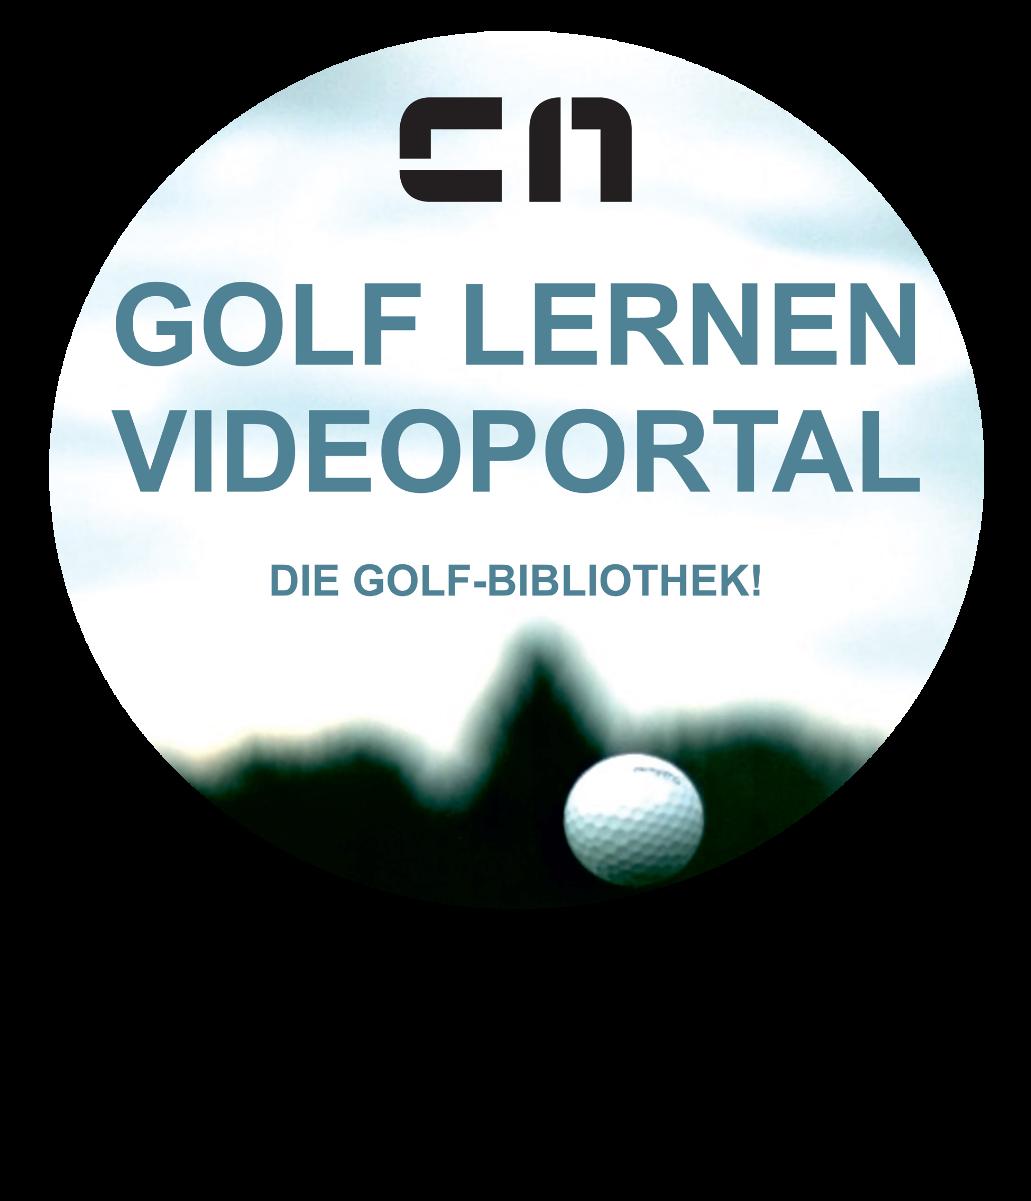 Golf lernen Videoportal